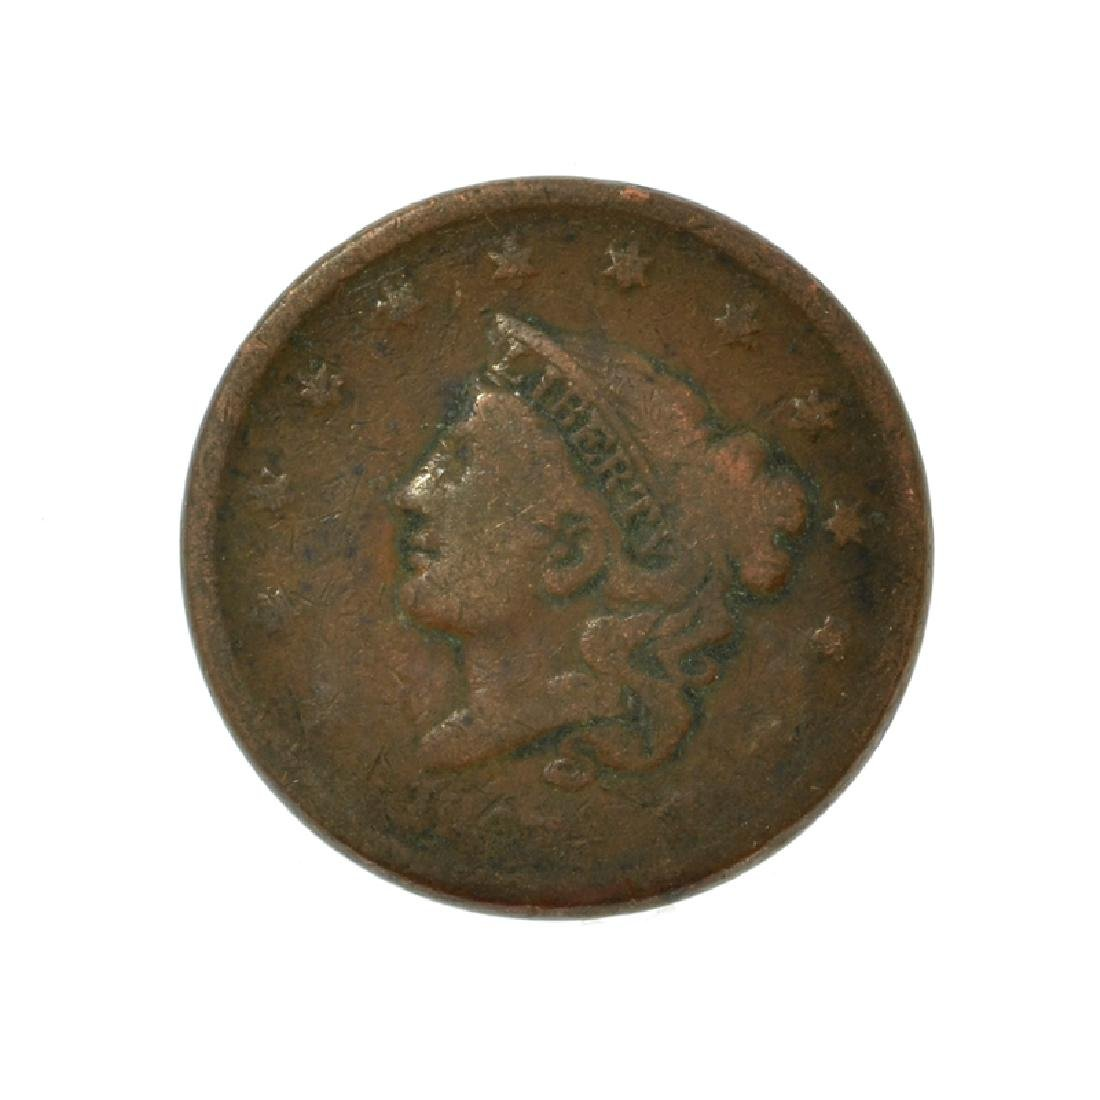 XXXX Large Cent Coin